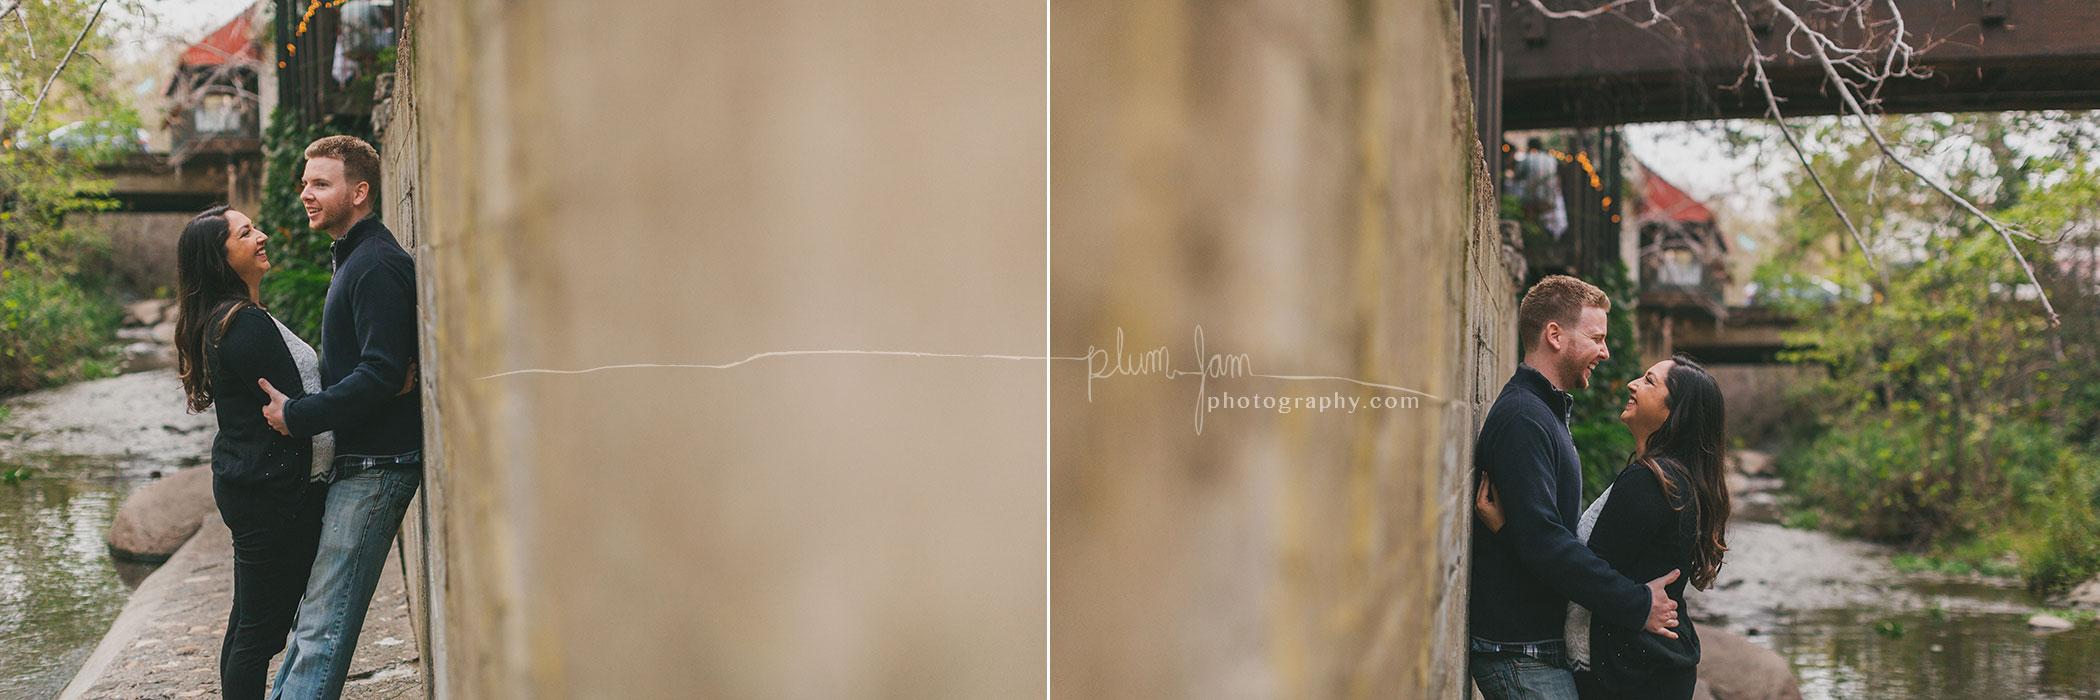 SelinaCameron07_PlumJamPhotography